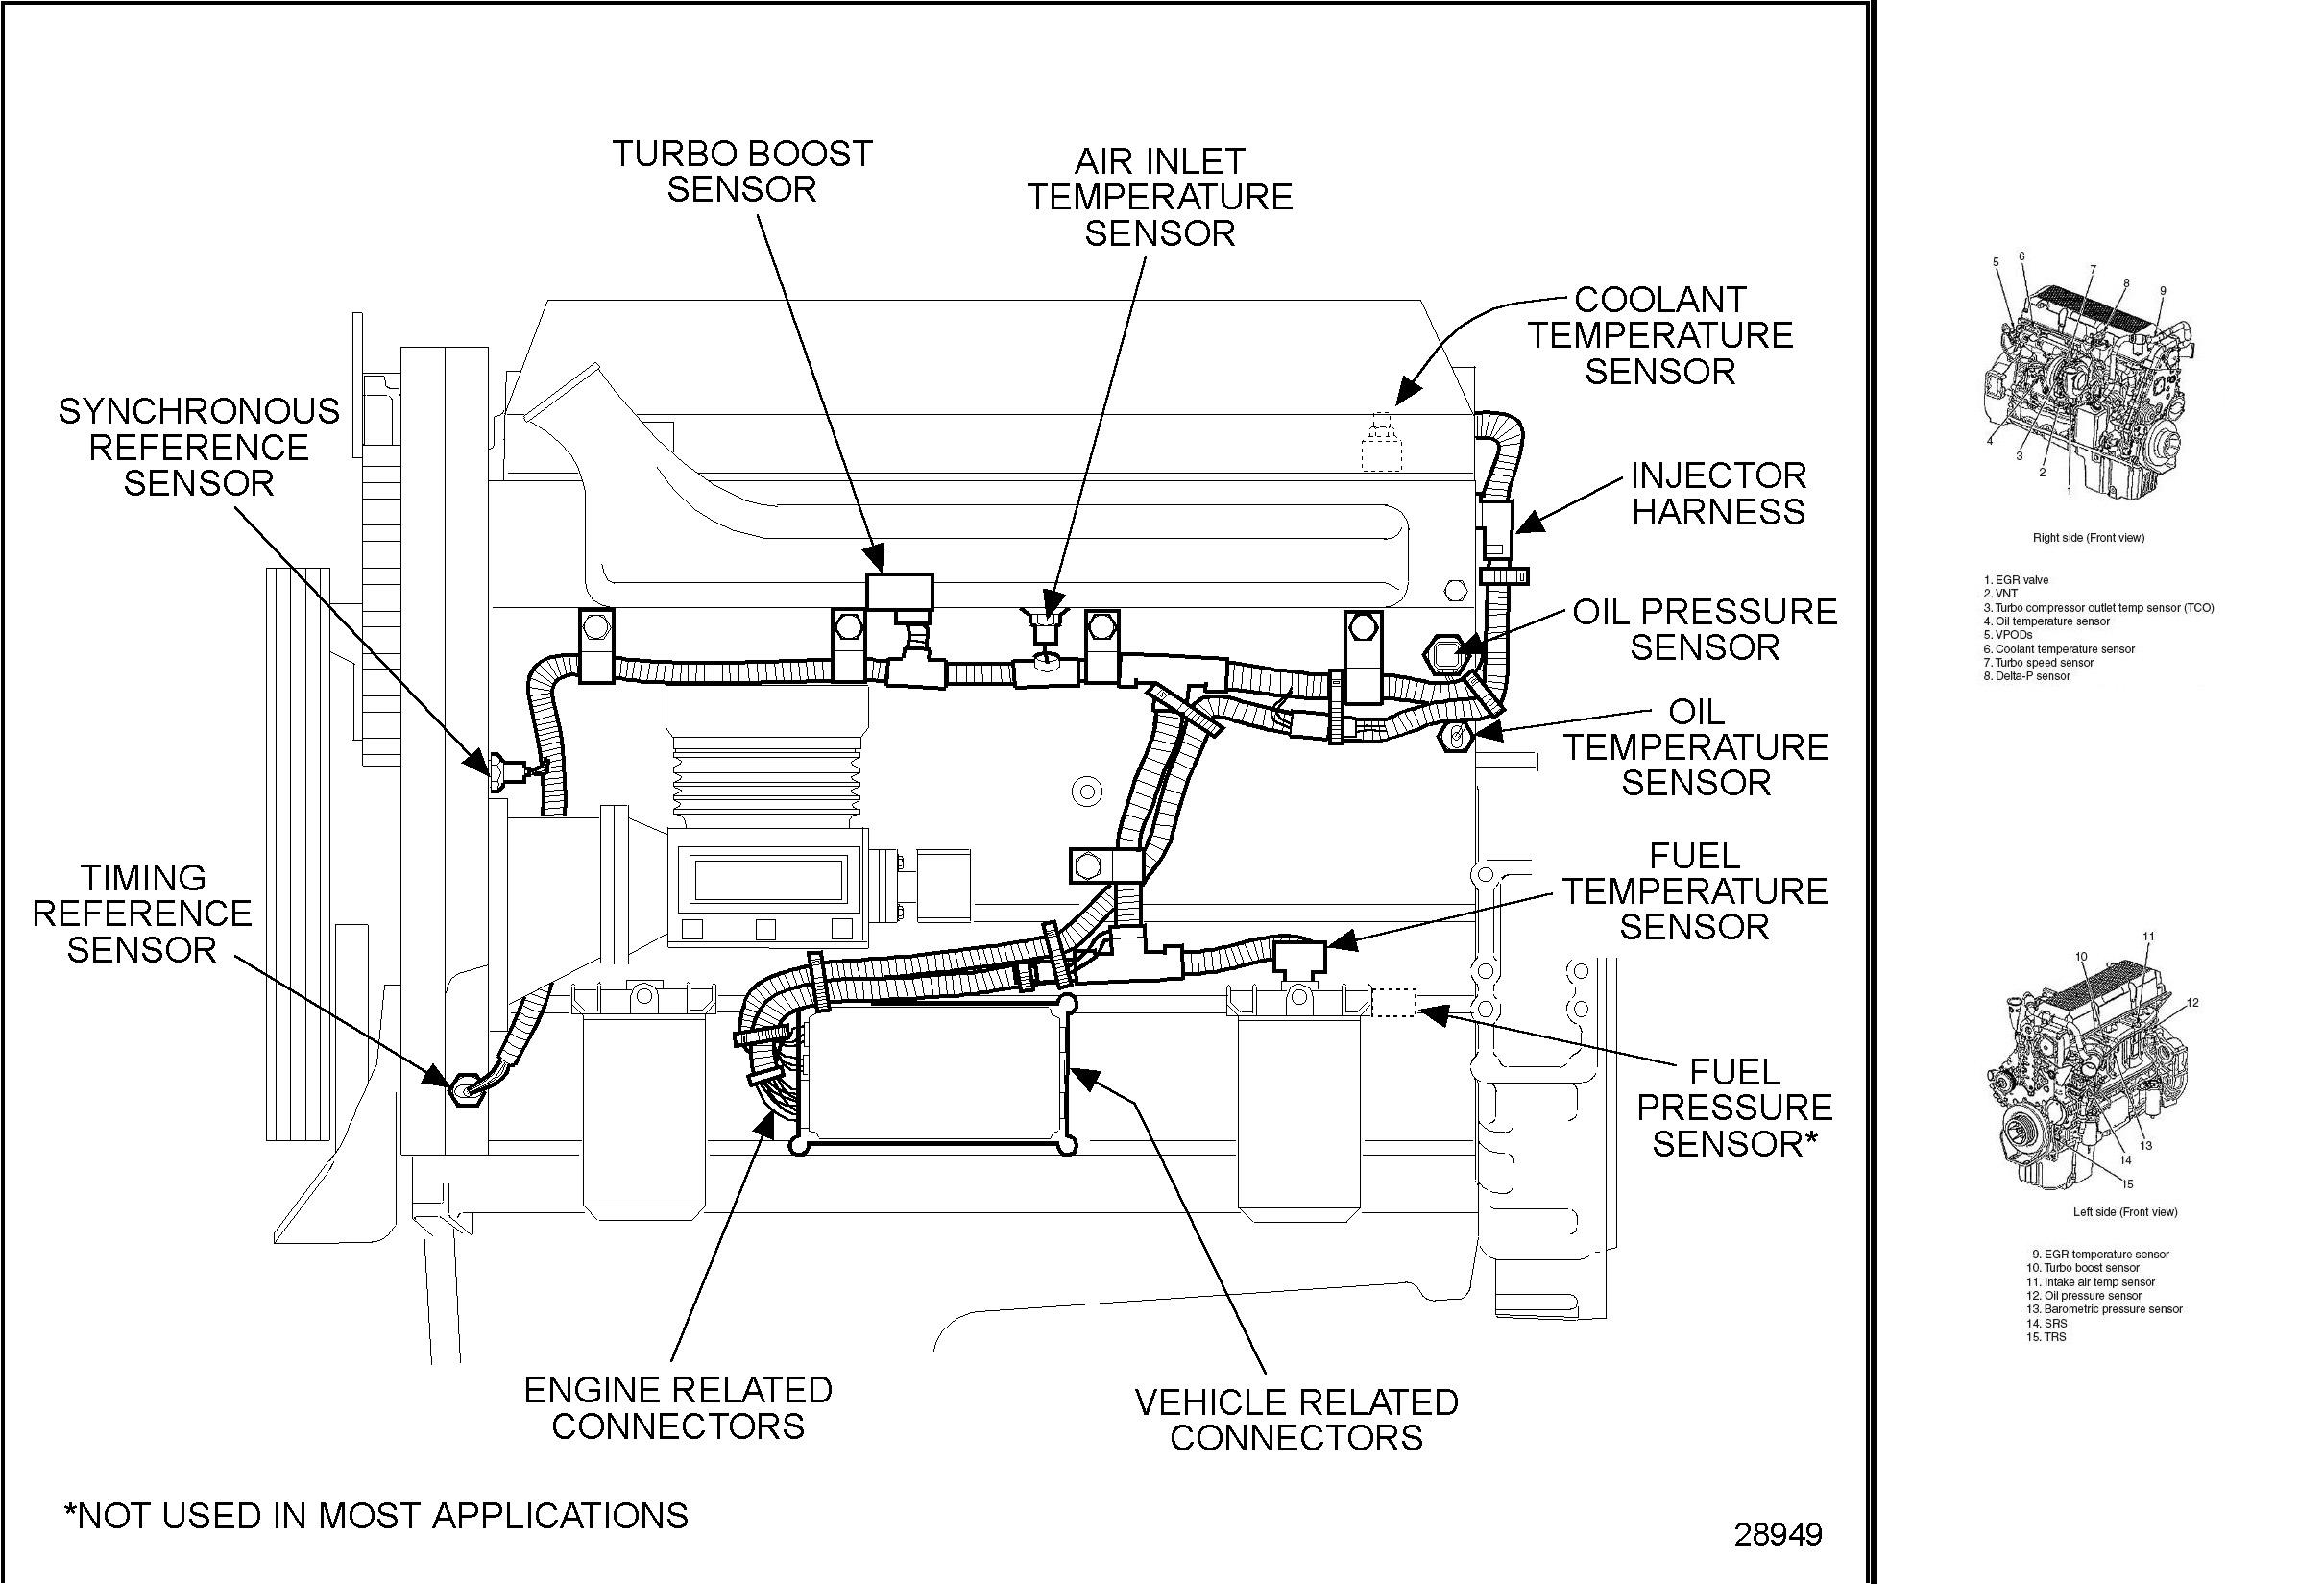 hight resolution of detroit diesel 60 engine sensors positions diagram